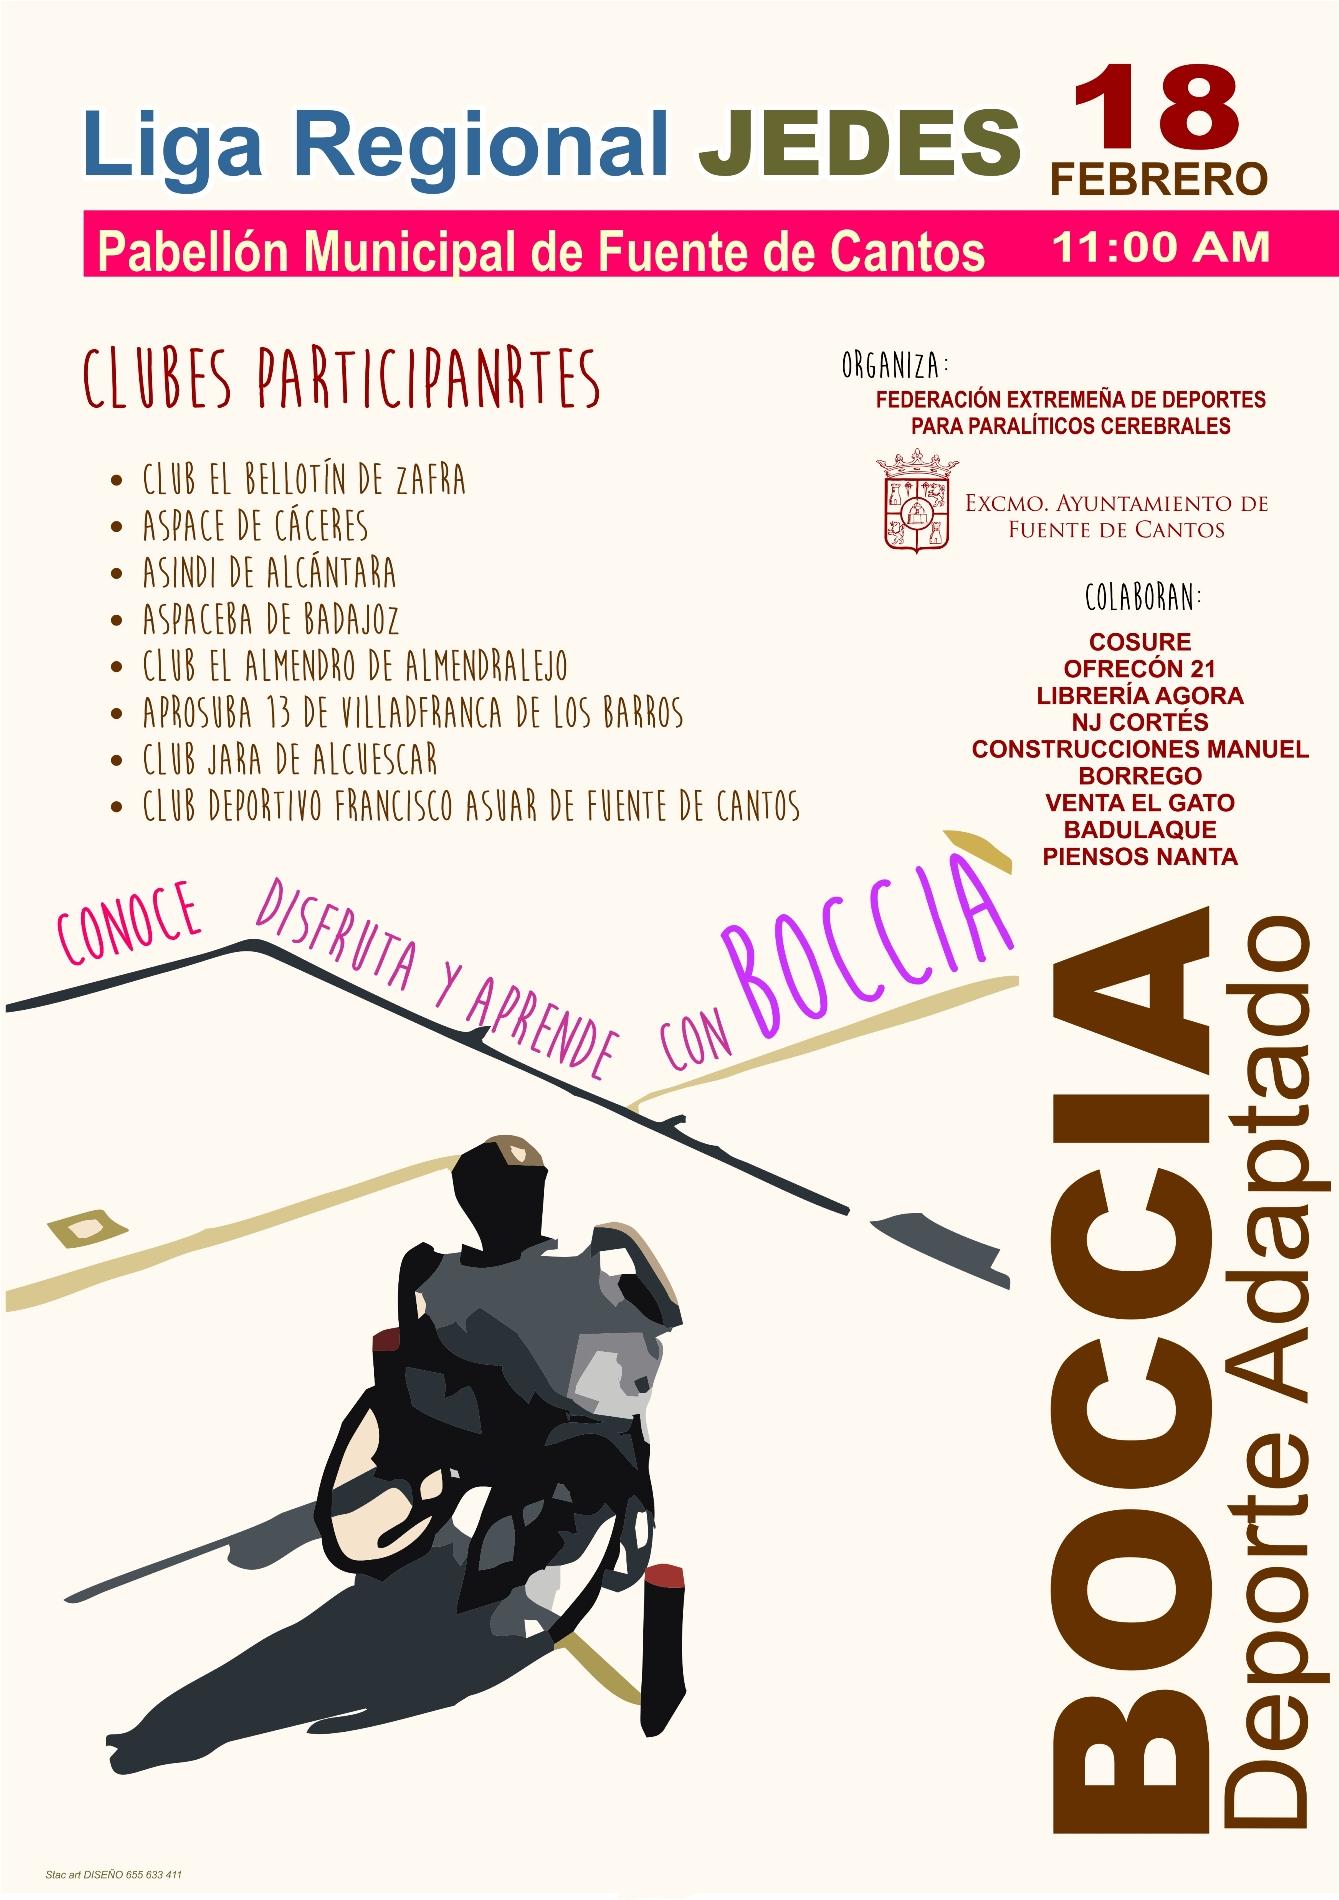 CARTEL BOCCIA deporte adaptado